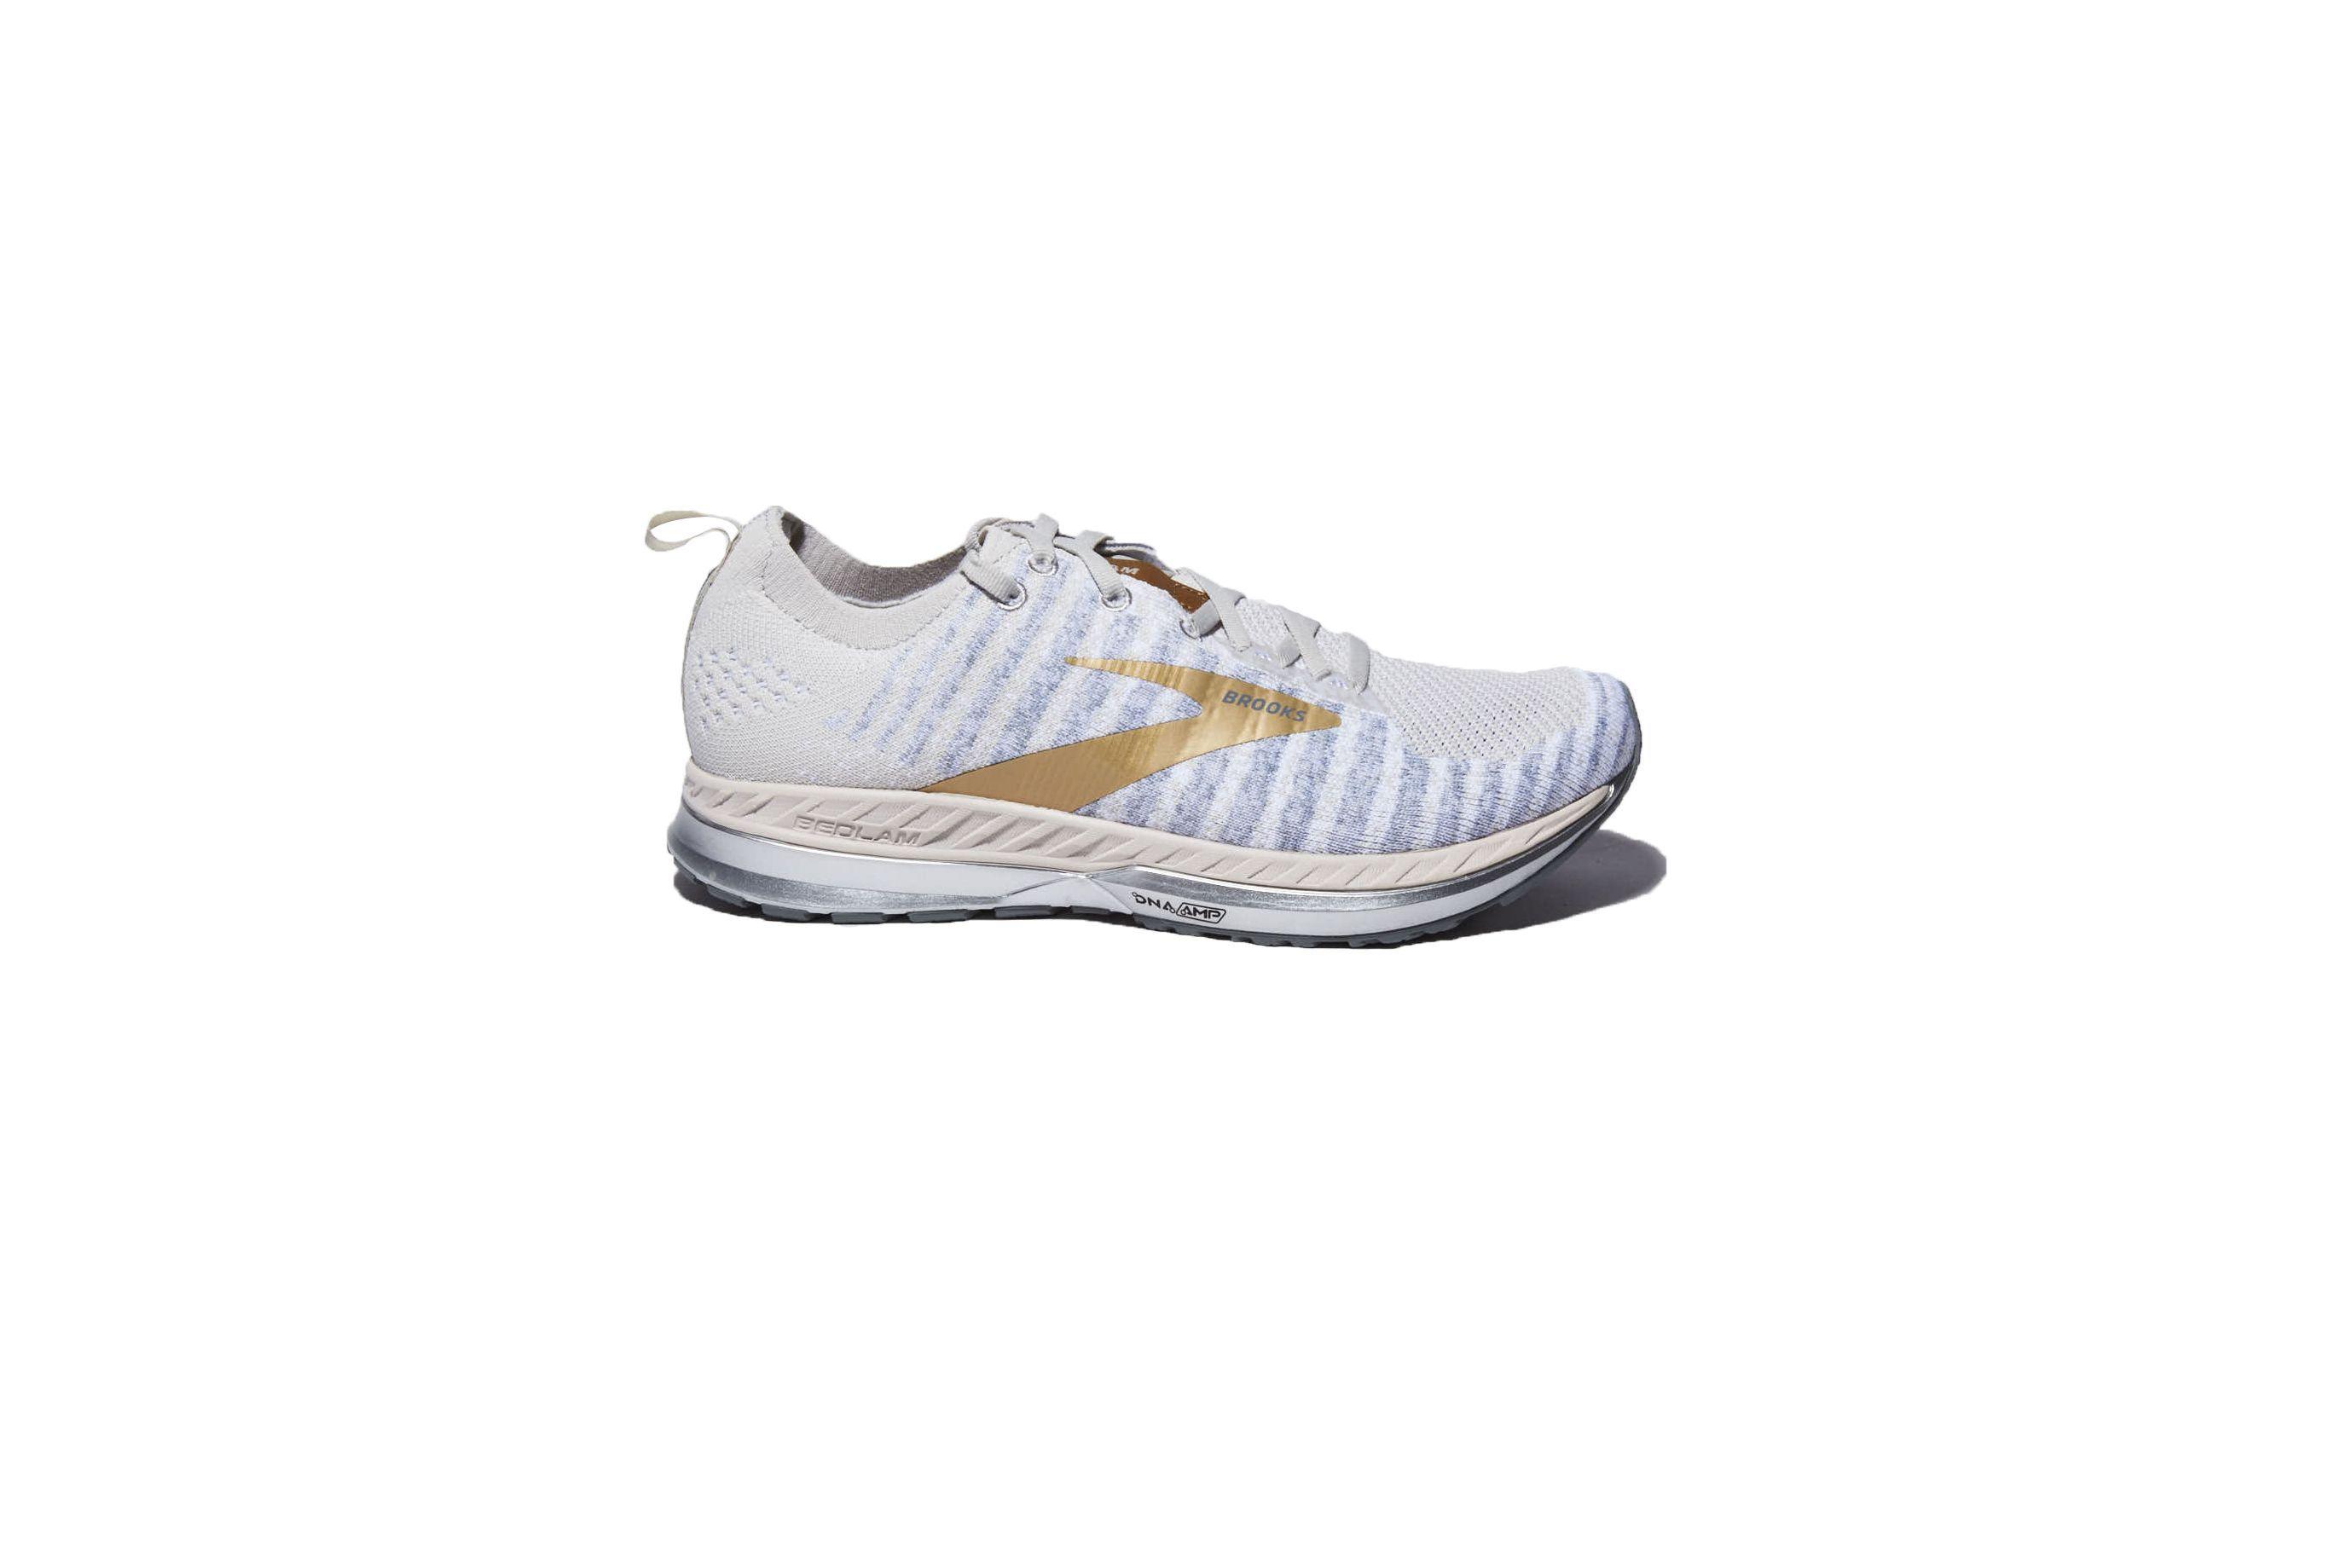 Brooks Bedlam 2 - New Running Shoes 2020